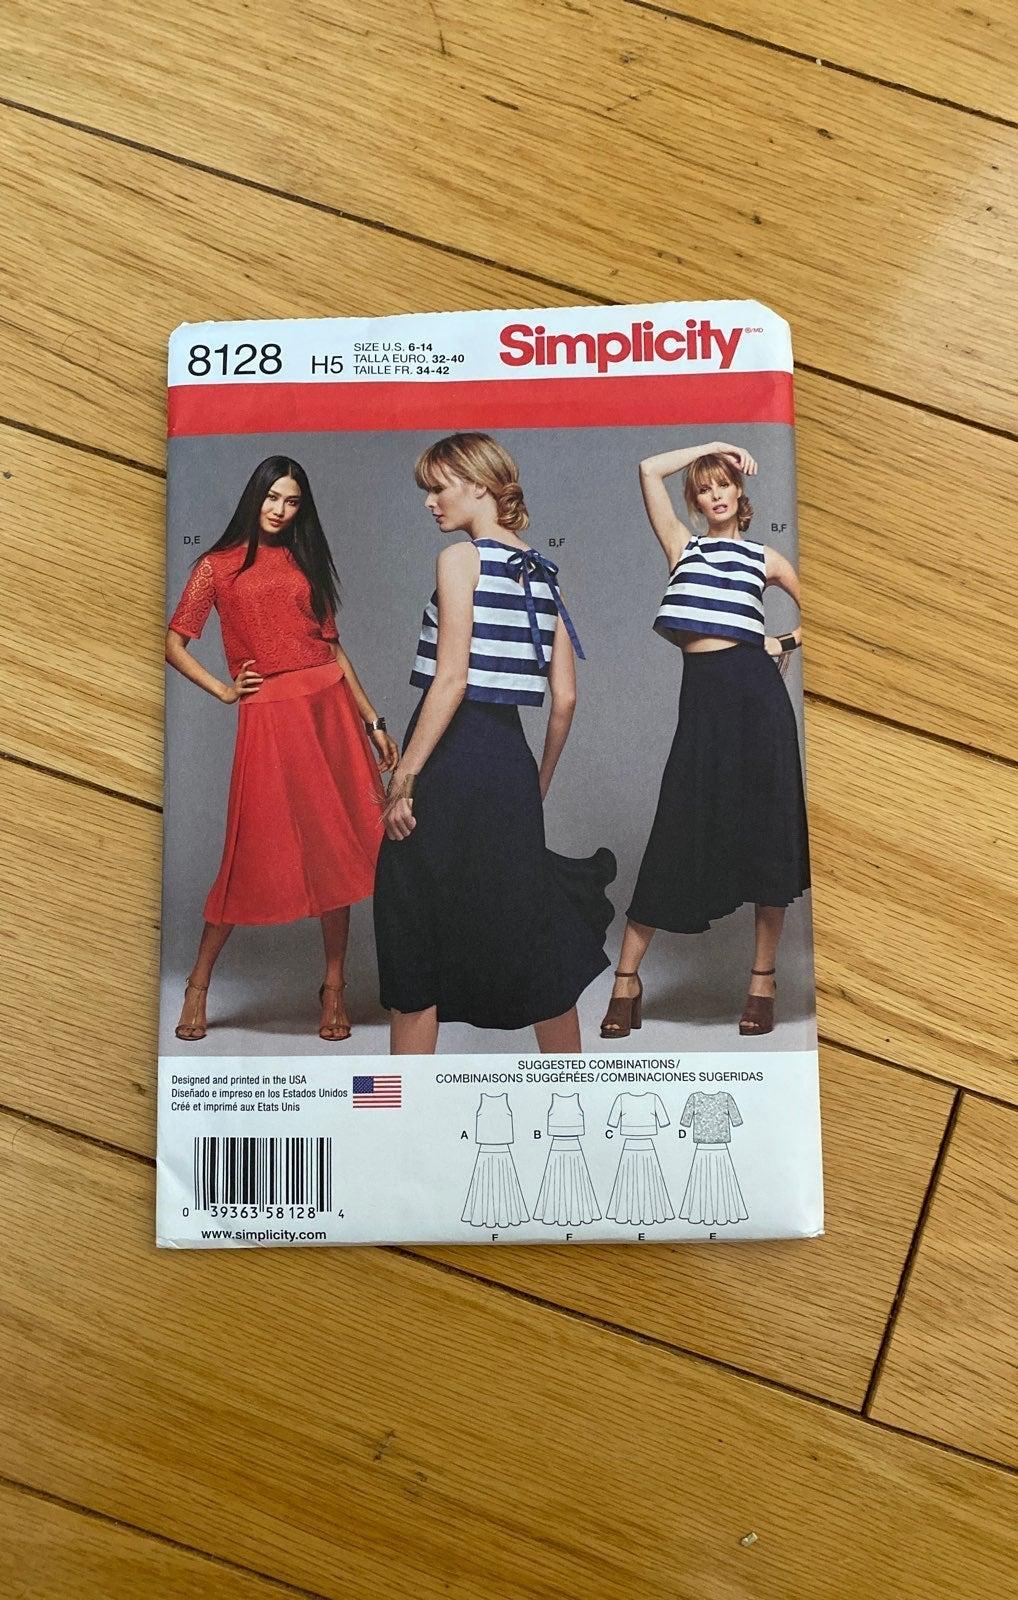 Simplicity 8128 pattern